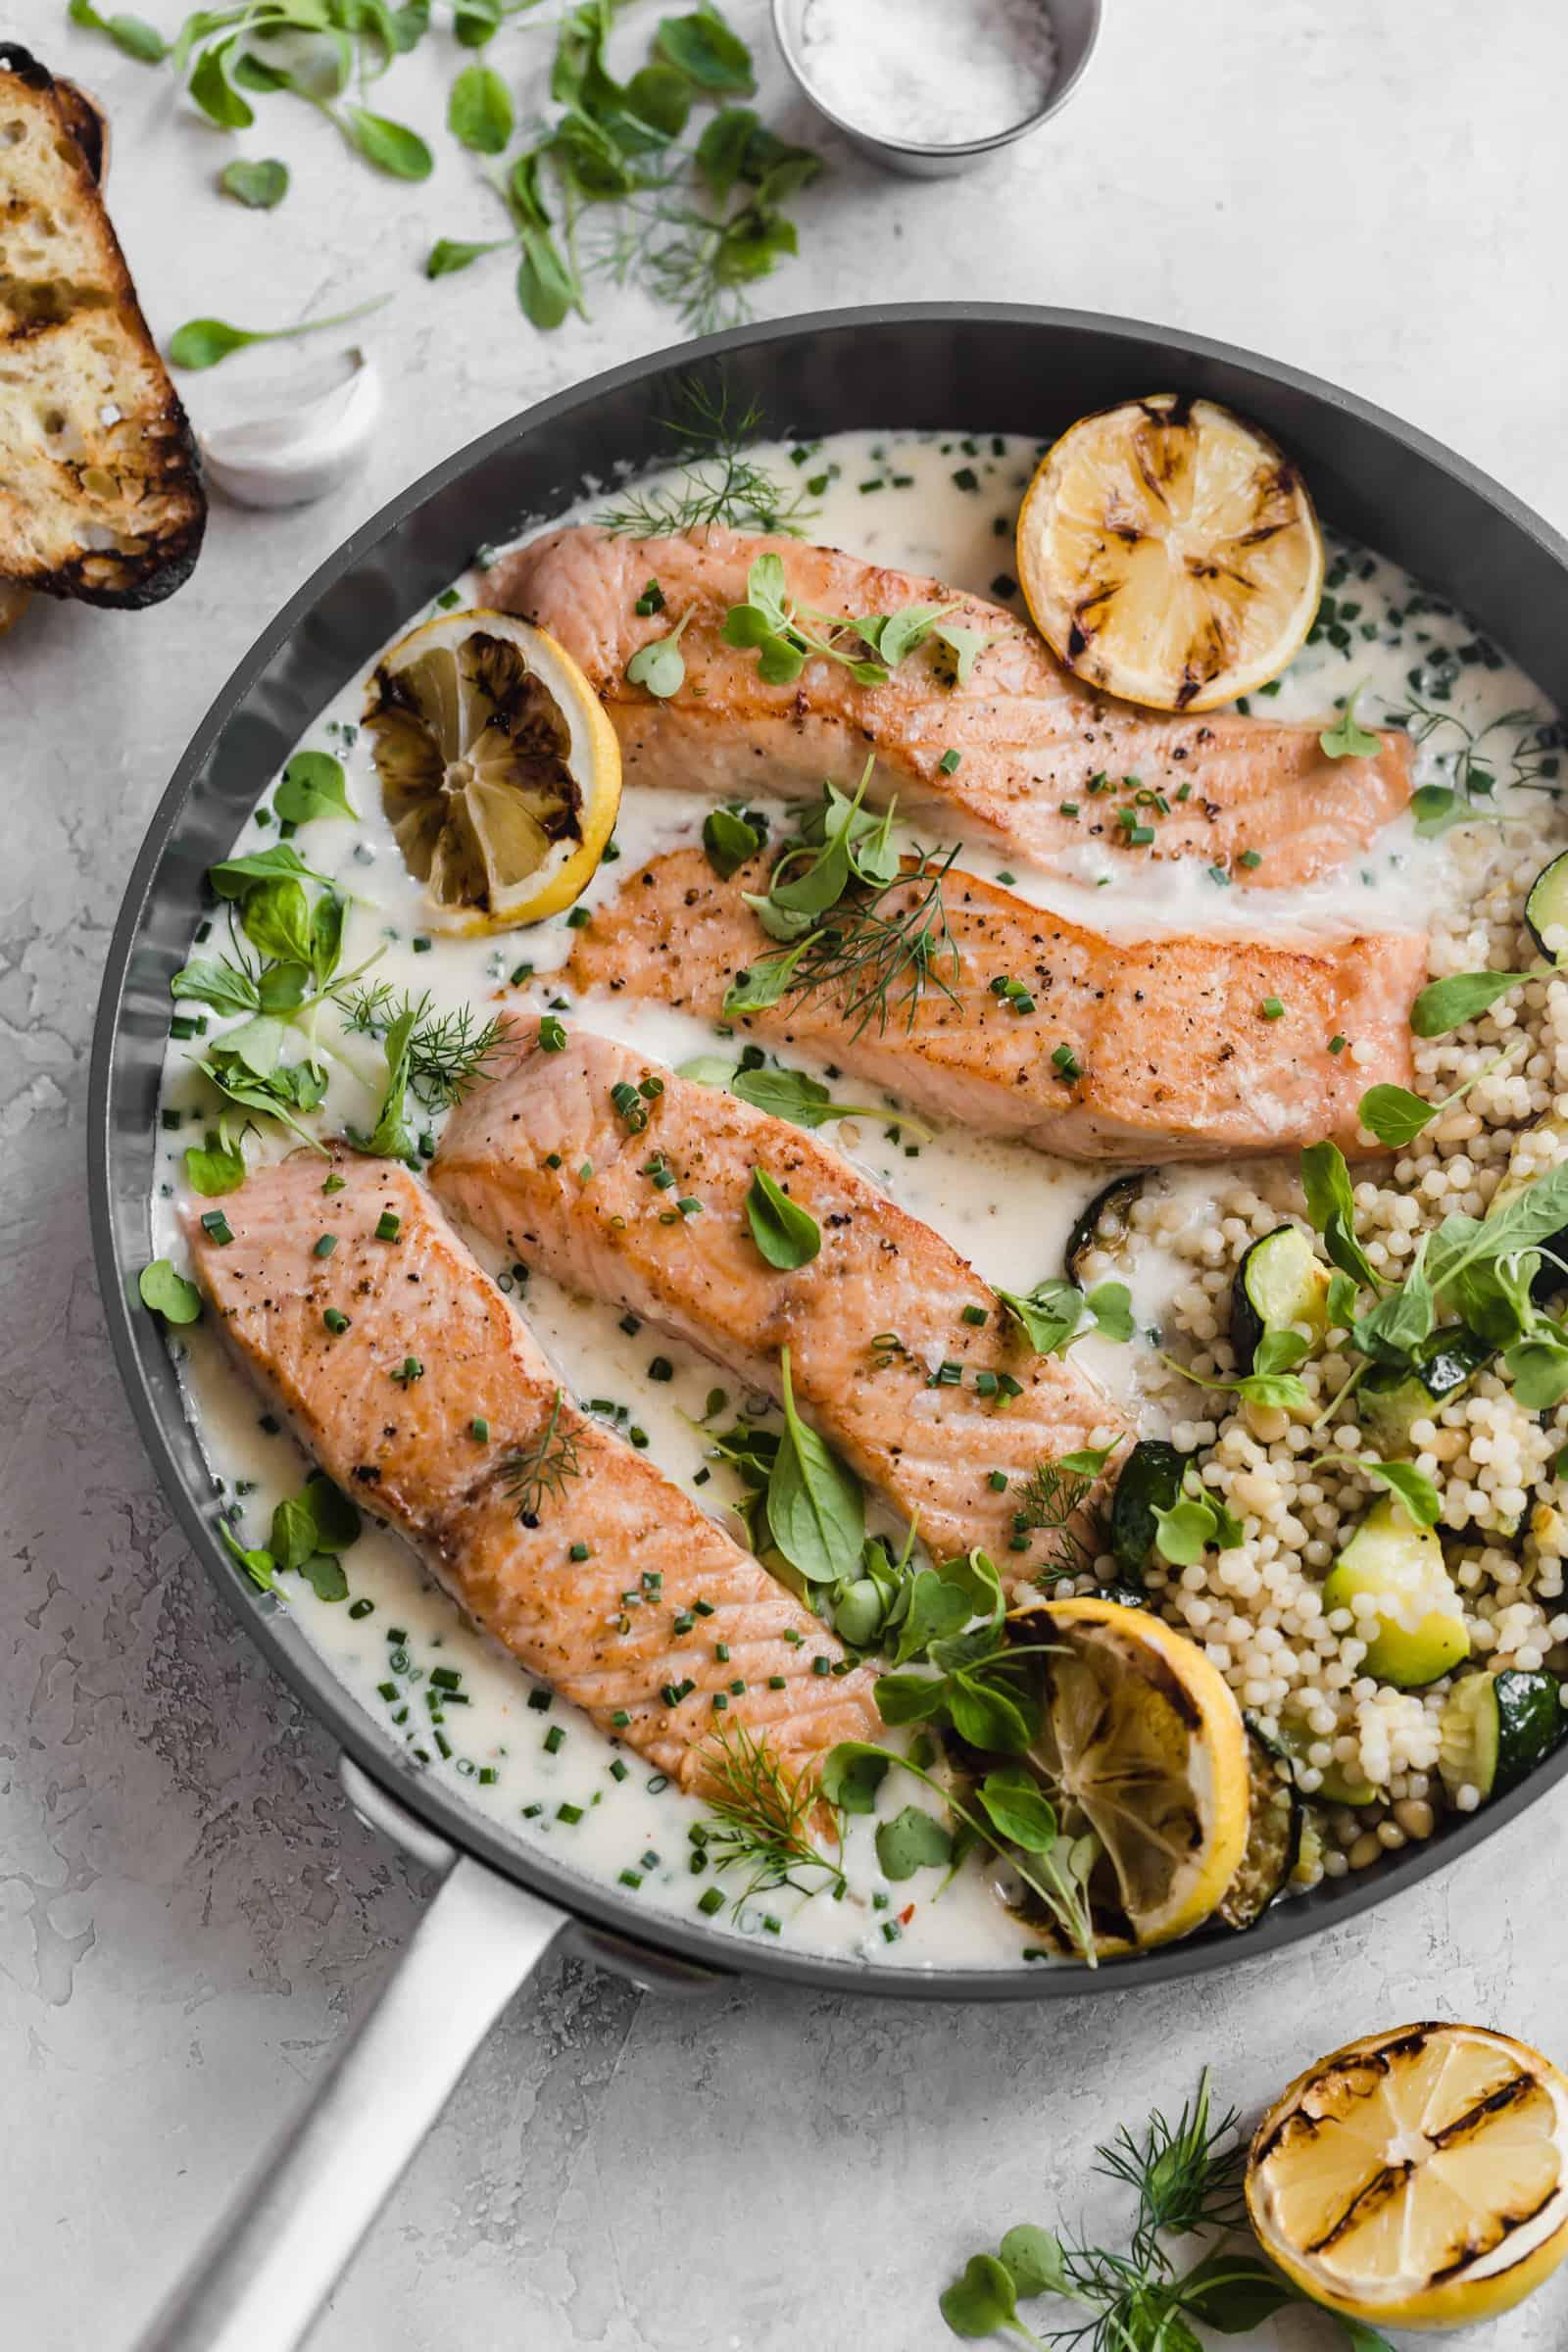 crispy skin salmon with lemon parmesan herb sauce